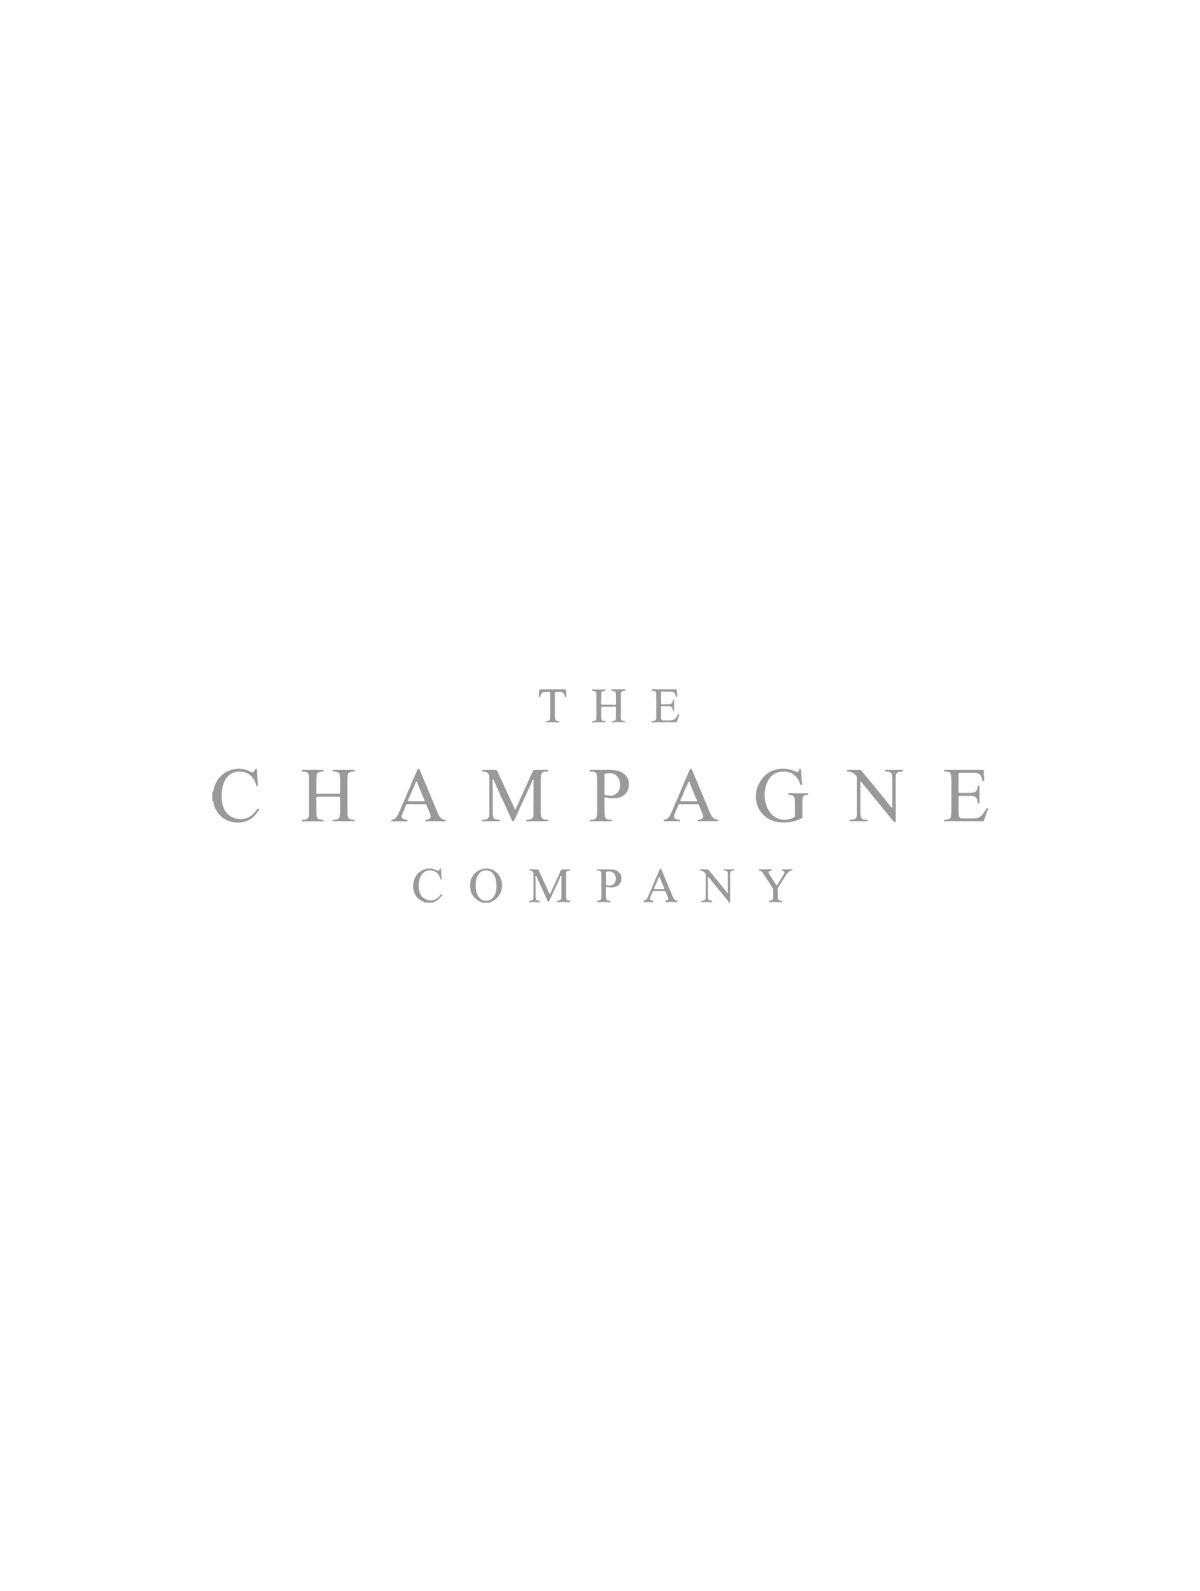 Ardbeg 10 Year Old Islay Single Malt Scotch Whisky 70cl Gift Box